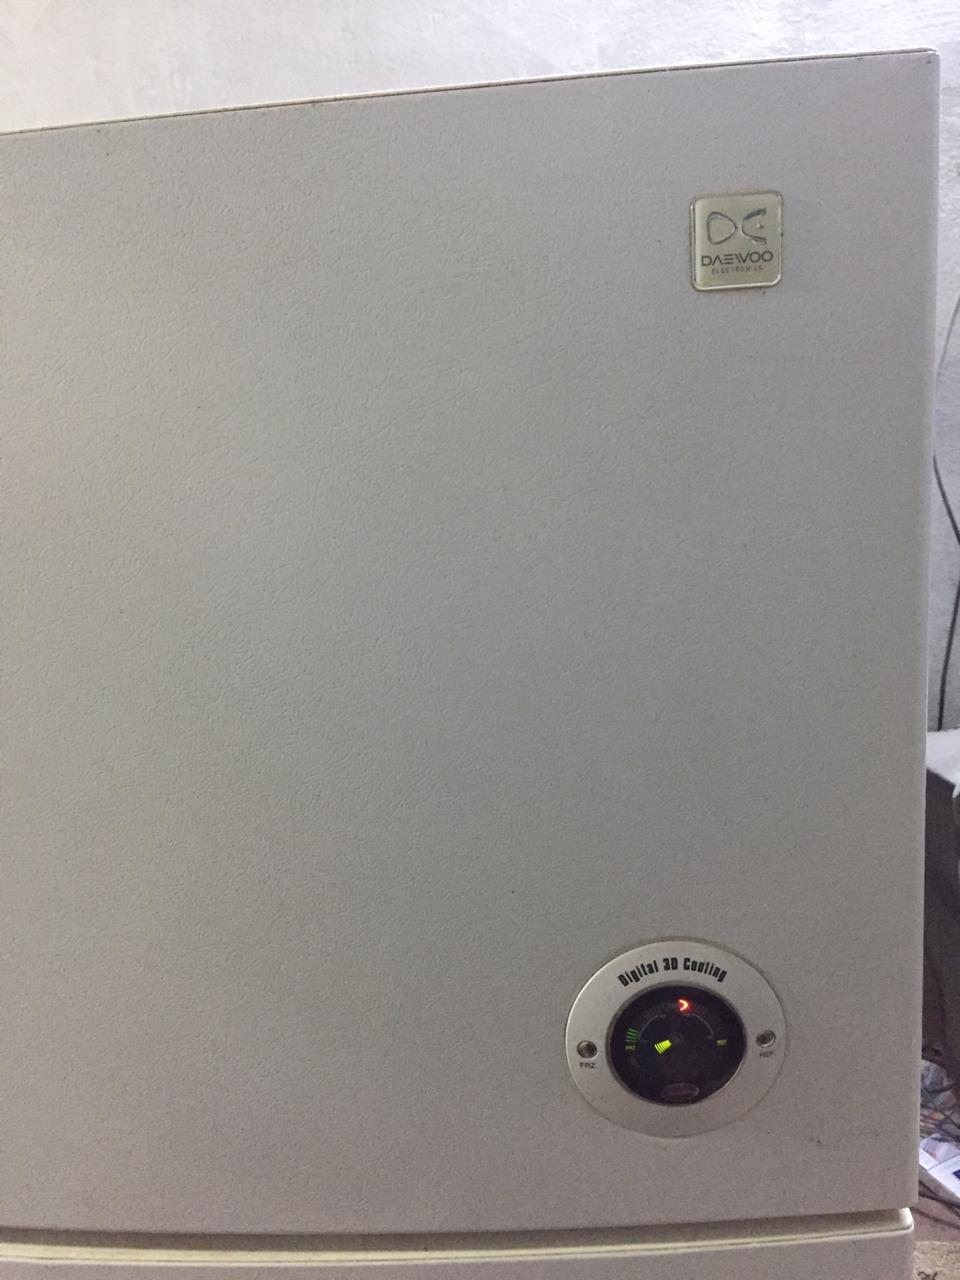 lg latest model fridge with 2doors side by side with water dispenser-  ثلاجات للبيع لا تنسَ أنك...